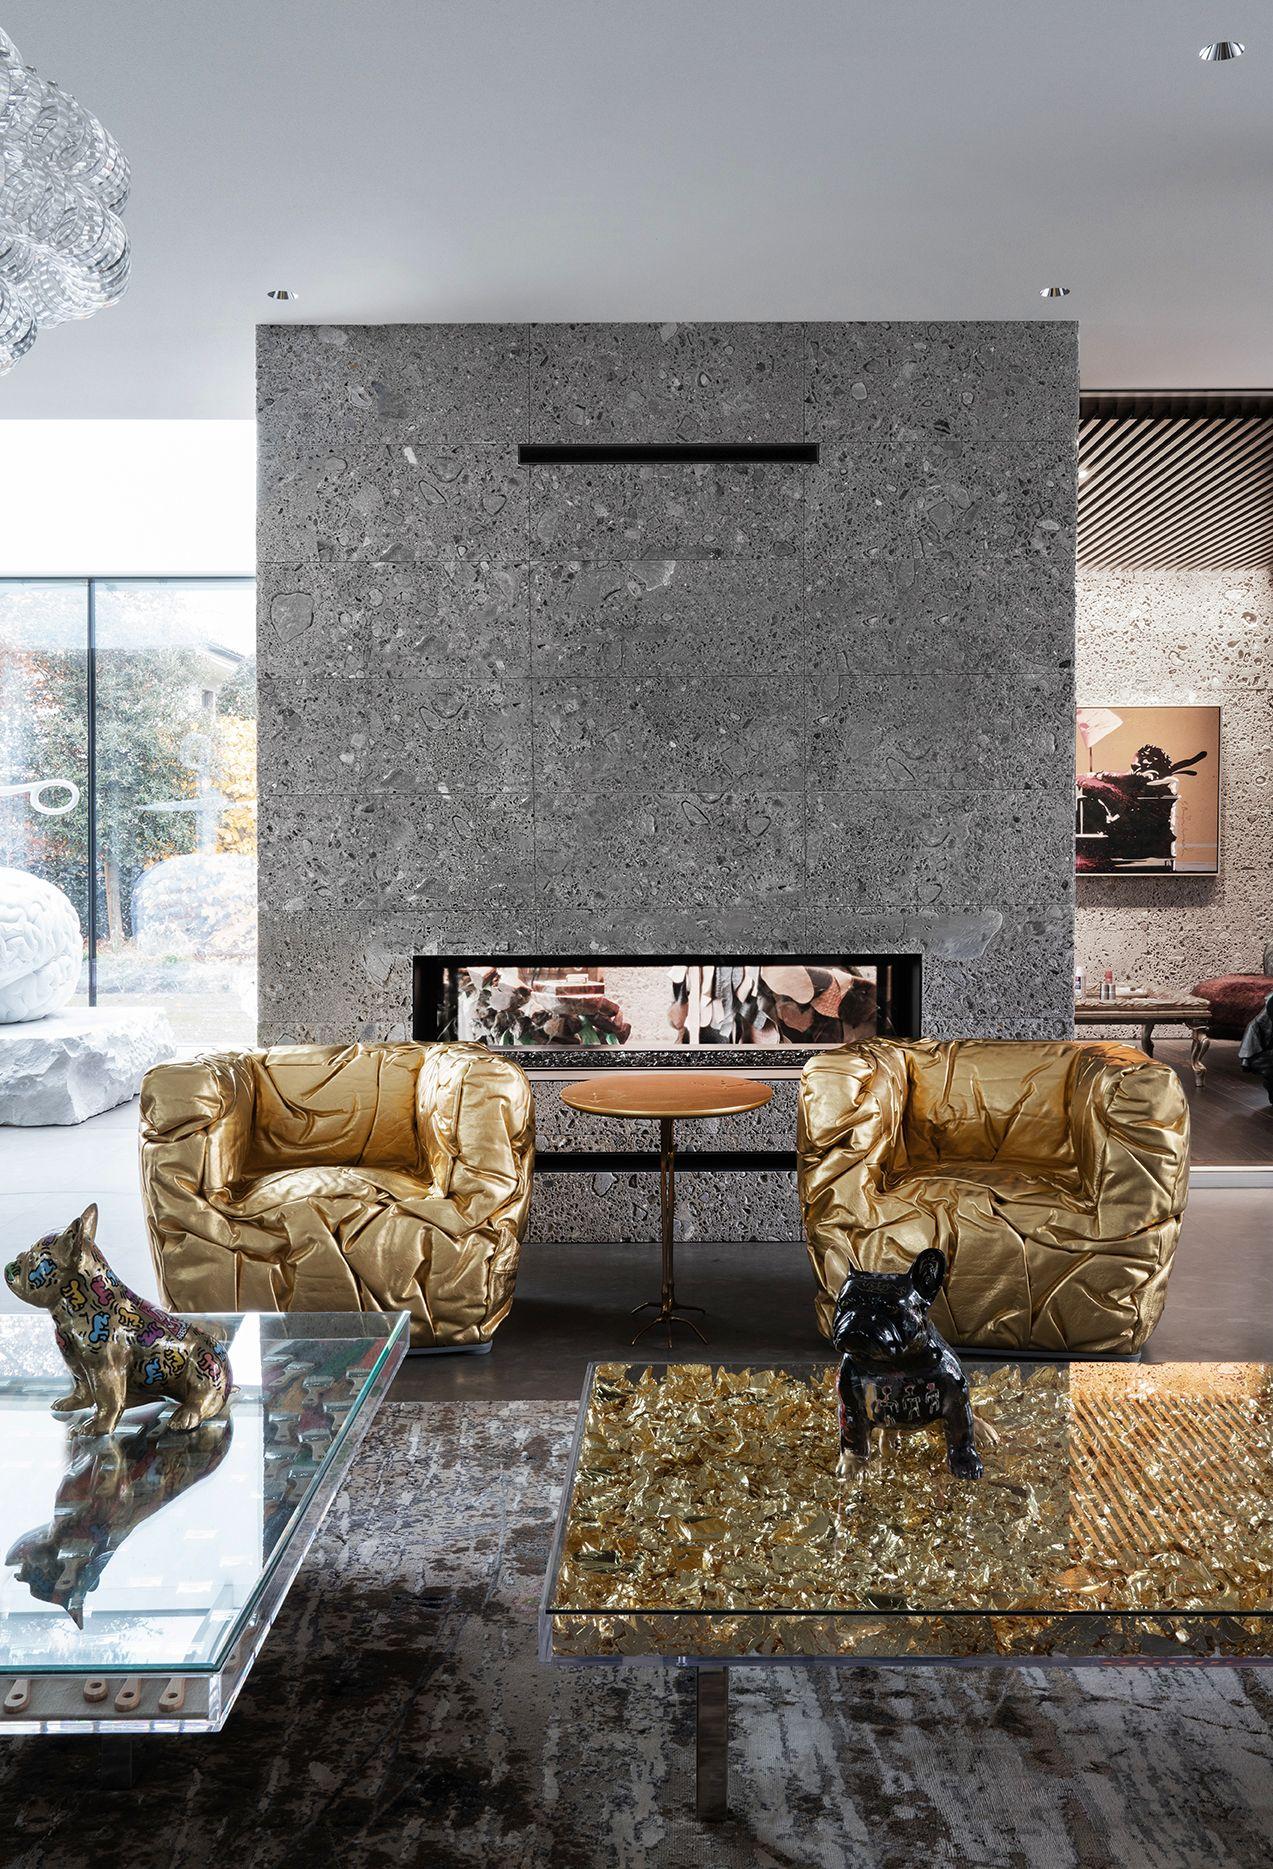 Villa in Svizzera - image 3